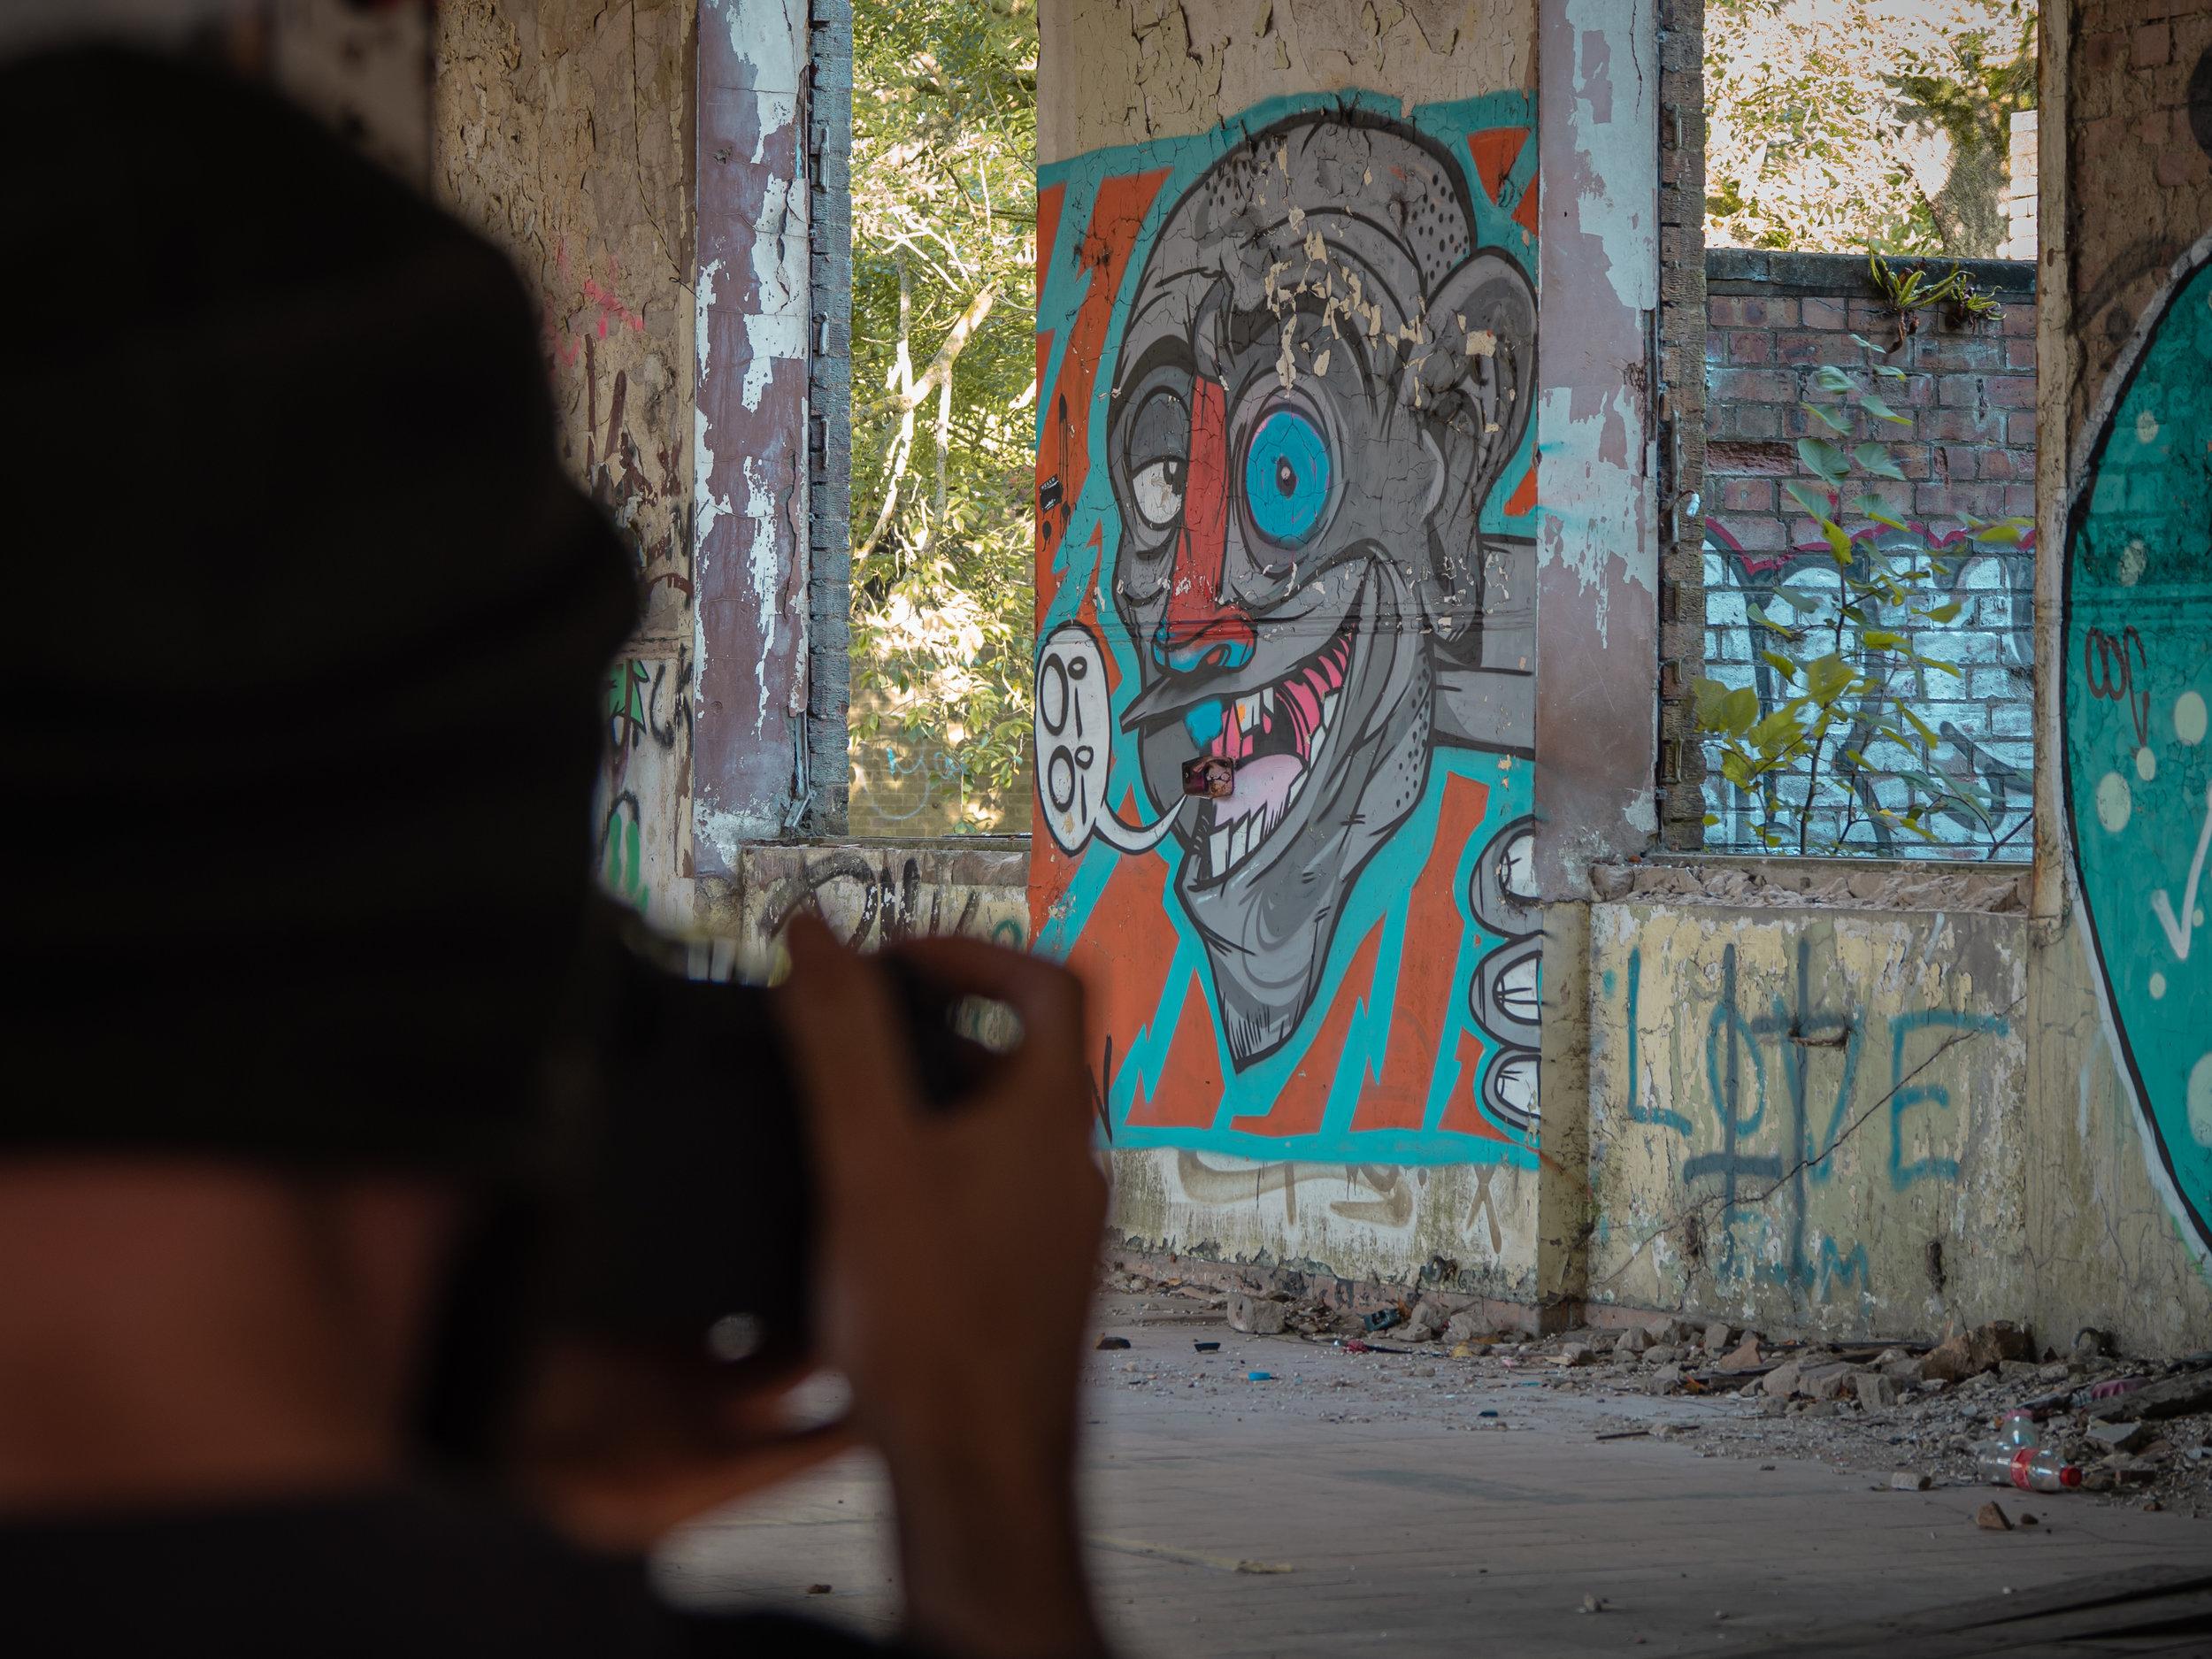 Urban Exploration Photography Experience